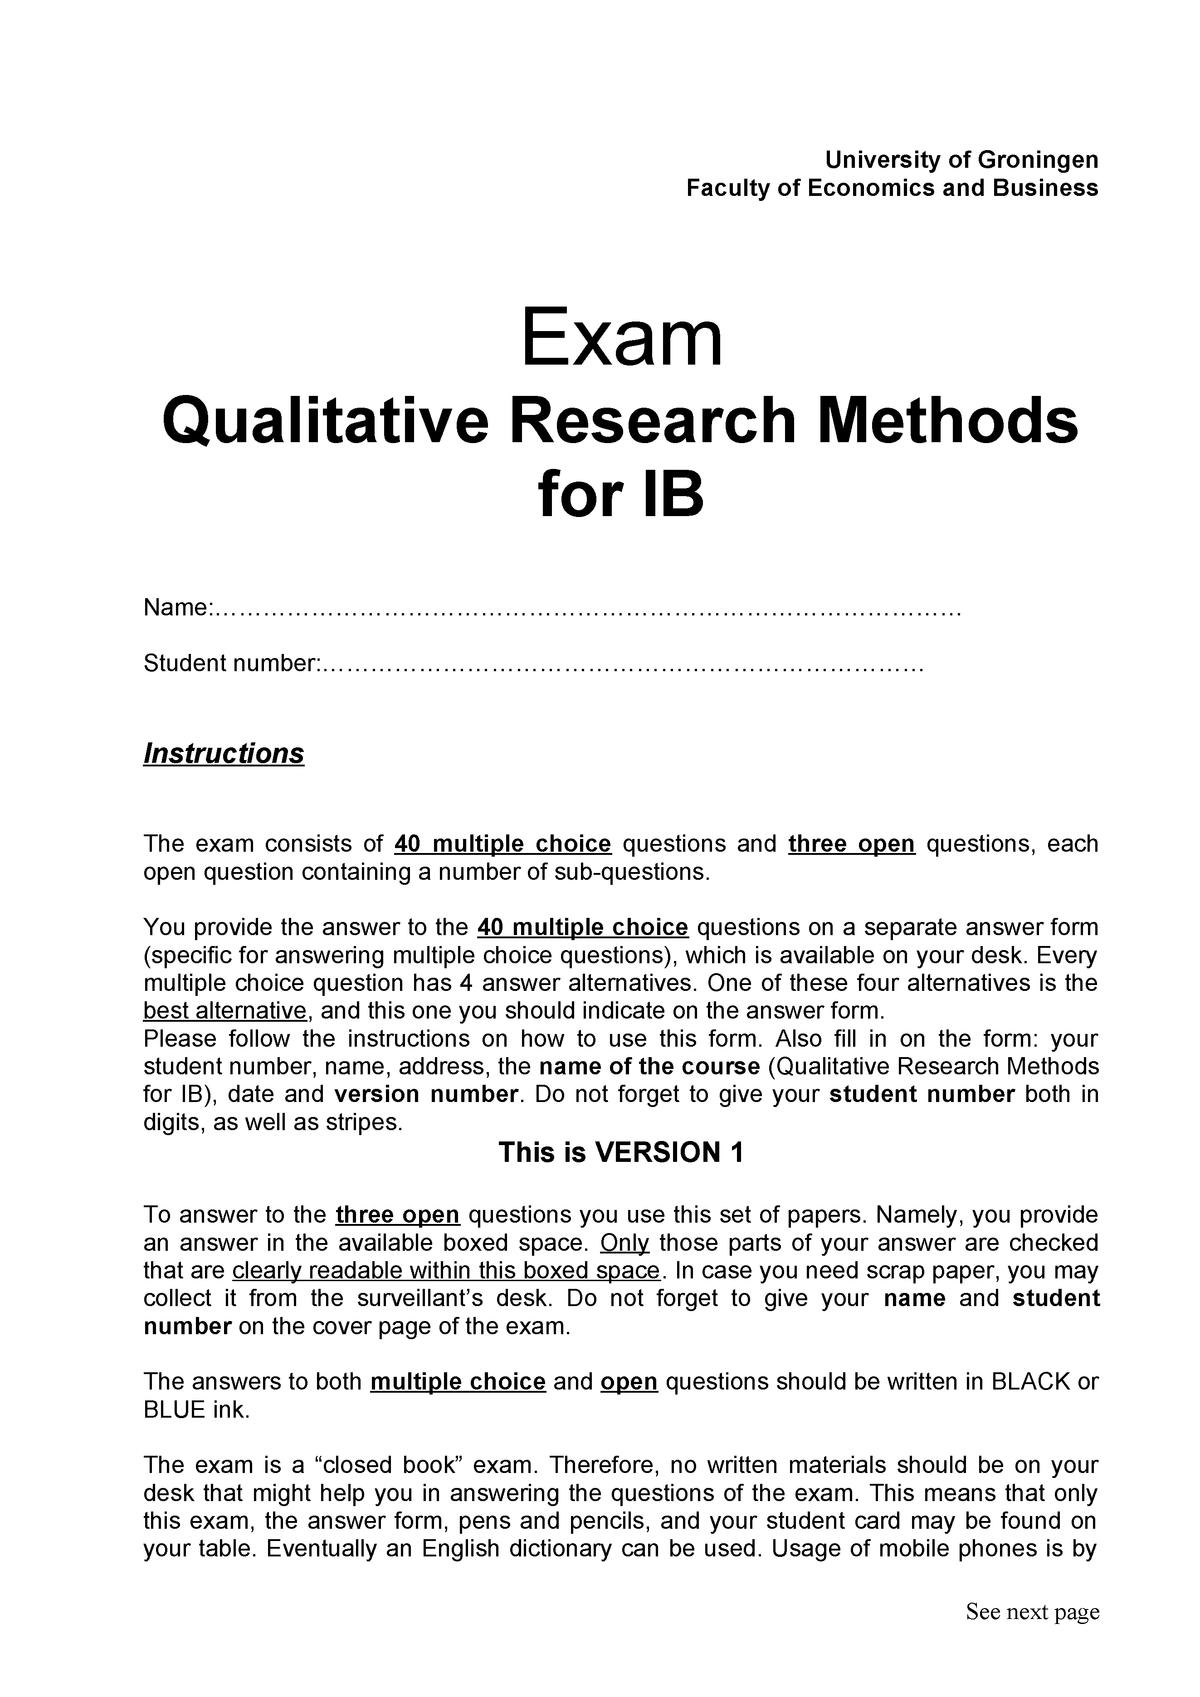 Exam 2017 - EBB633B05: Qualitative Research Methods for IB - StuDocu